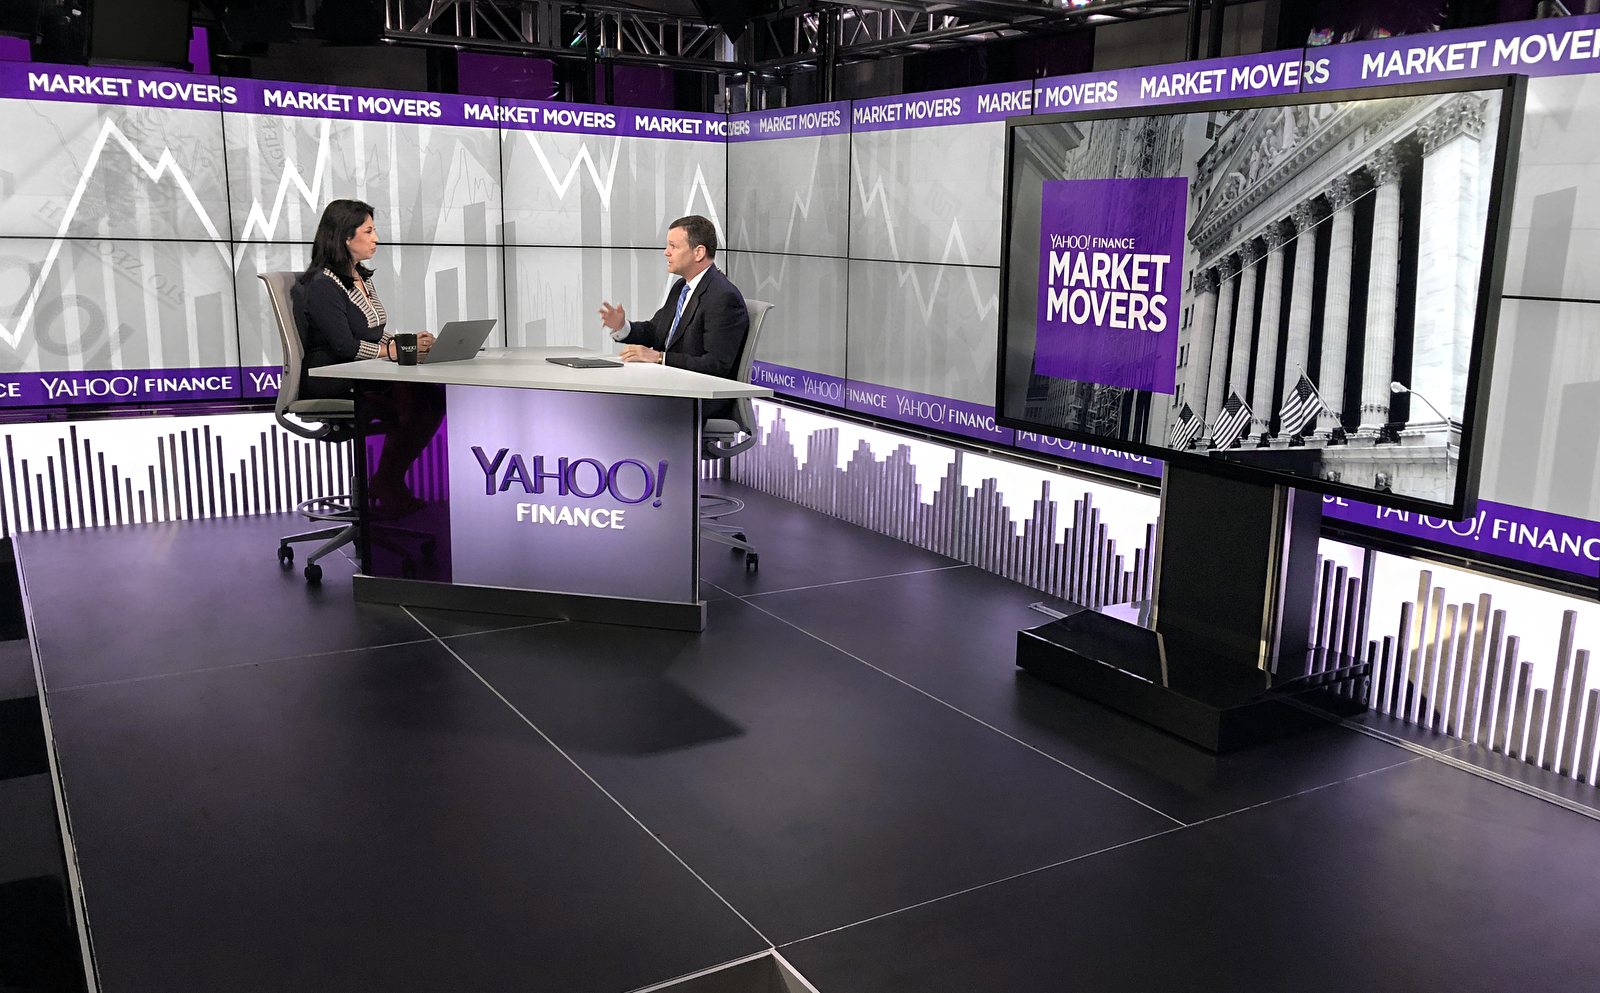 ncs_Yahoo-Finance-TV-Studio_0001